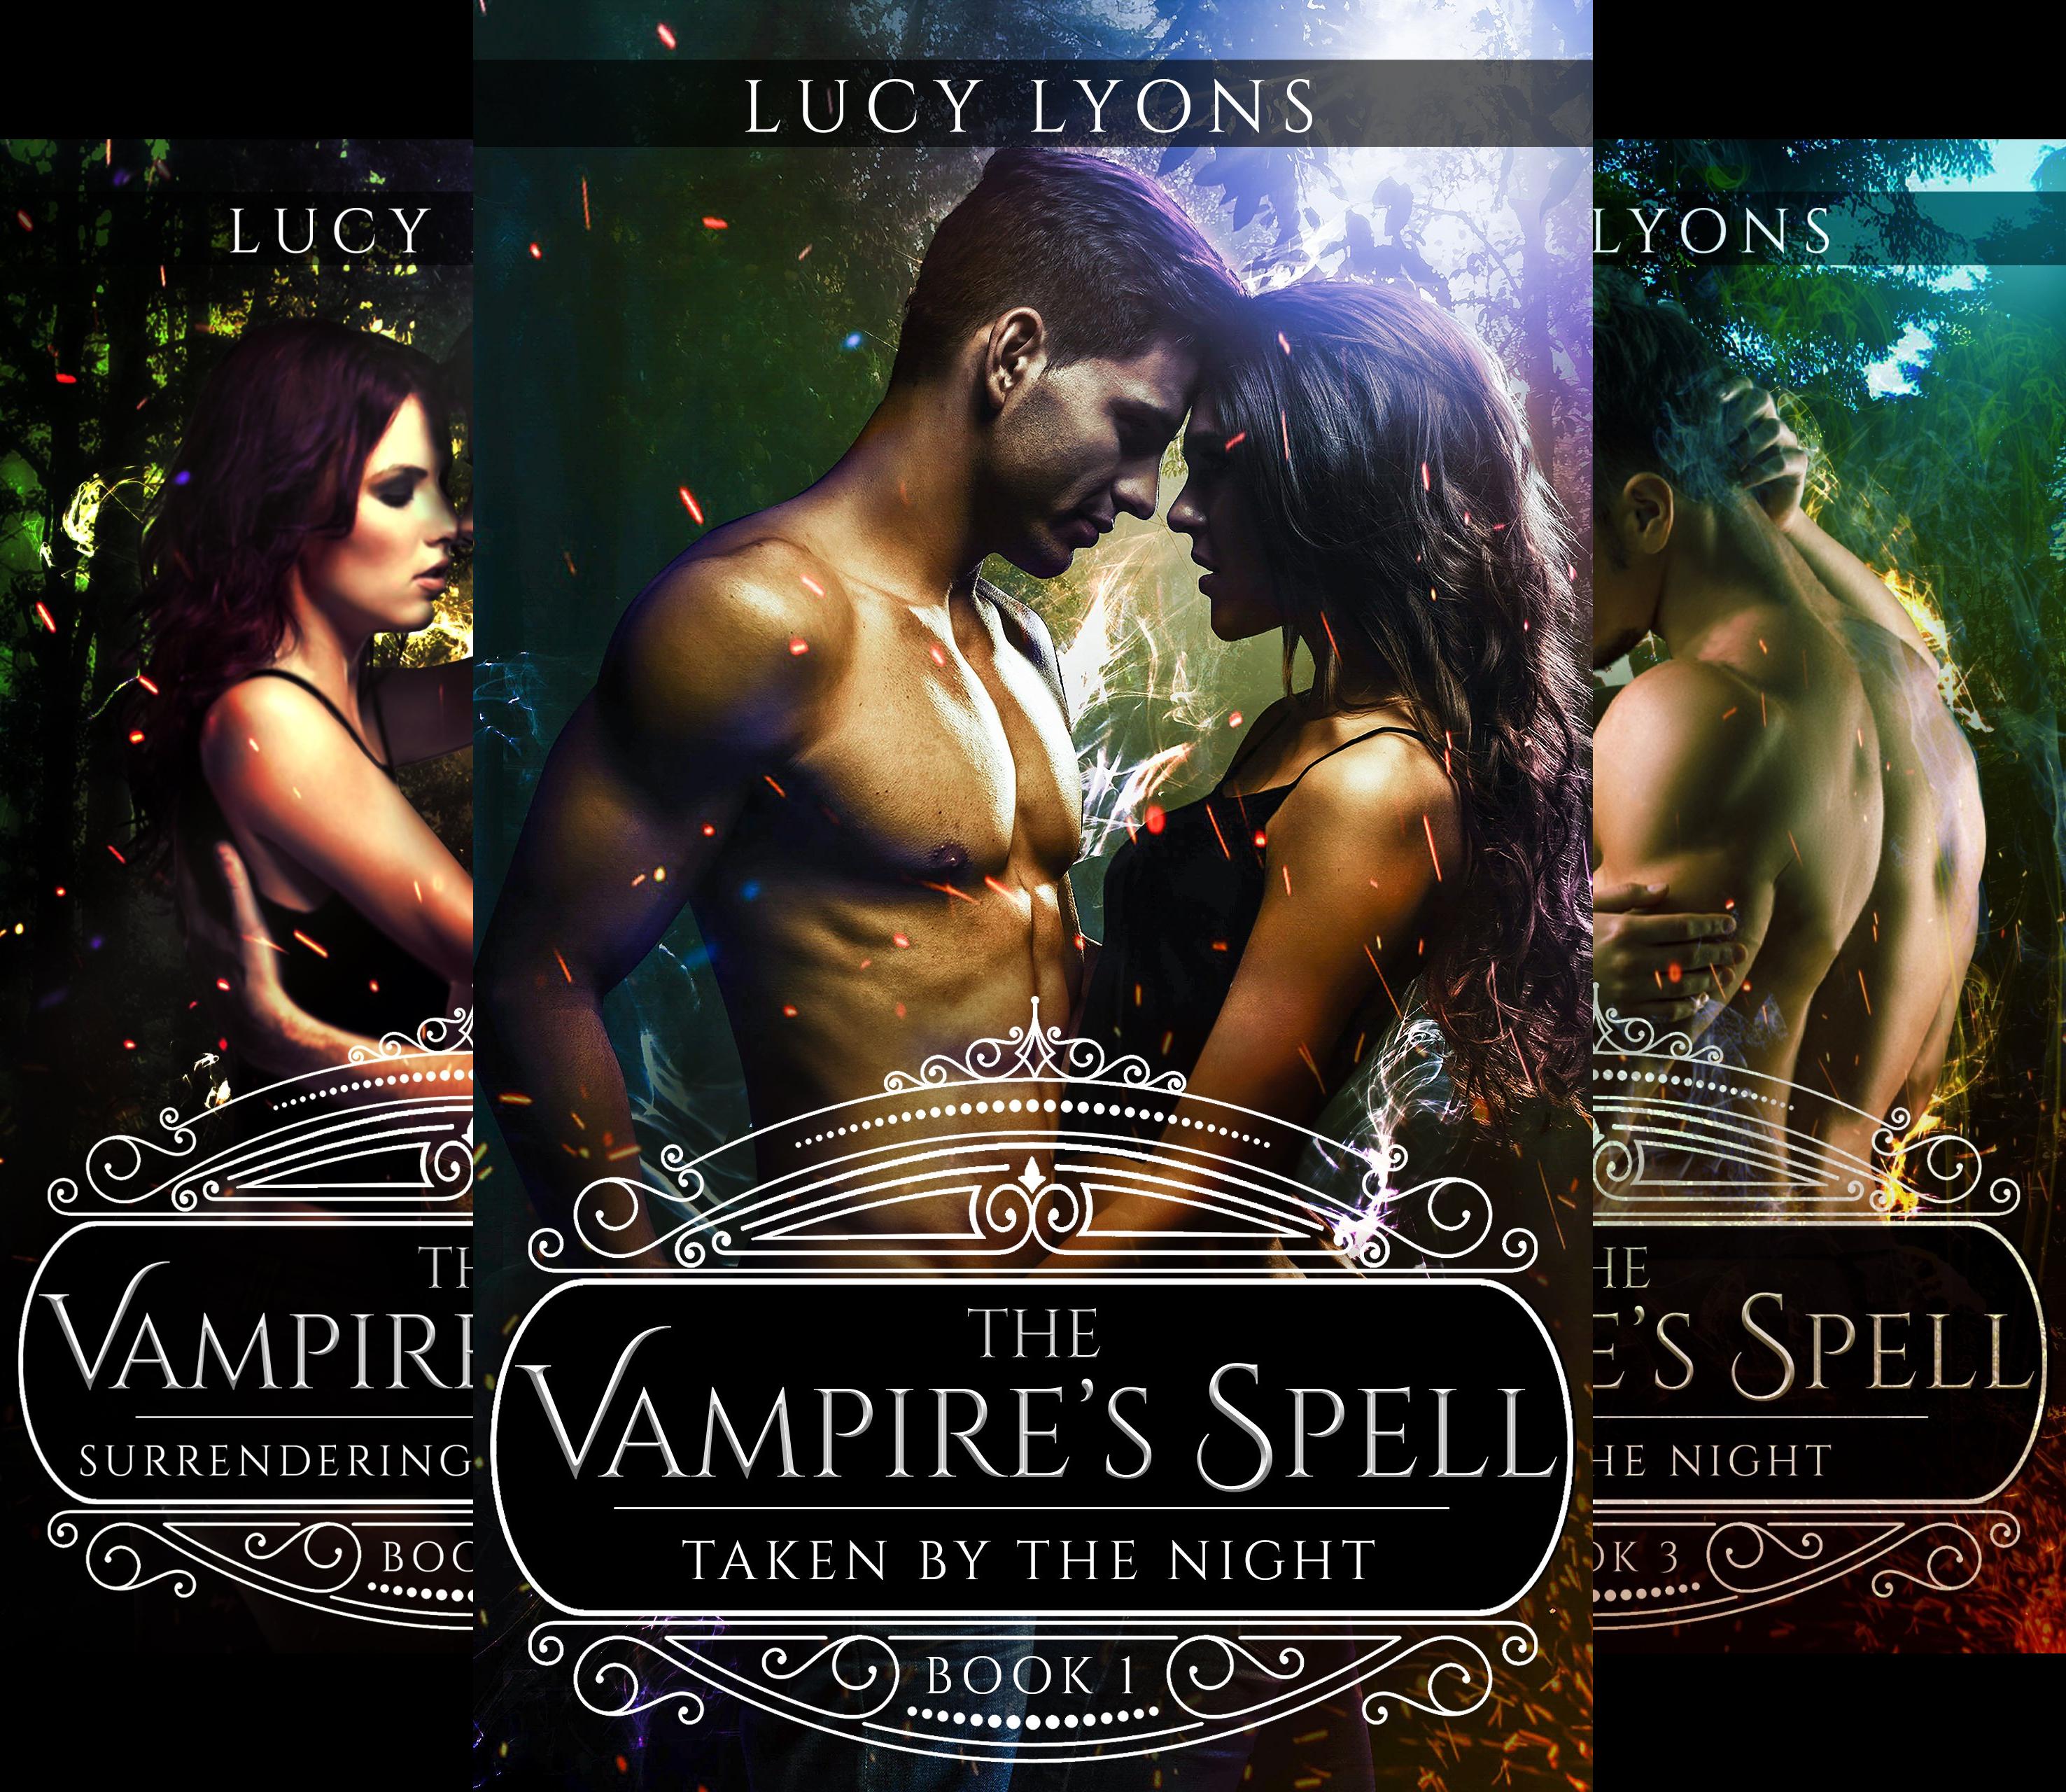 The Vampire's Spell (8 Book Series)